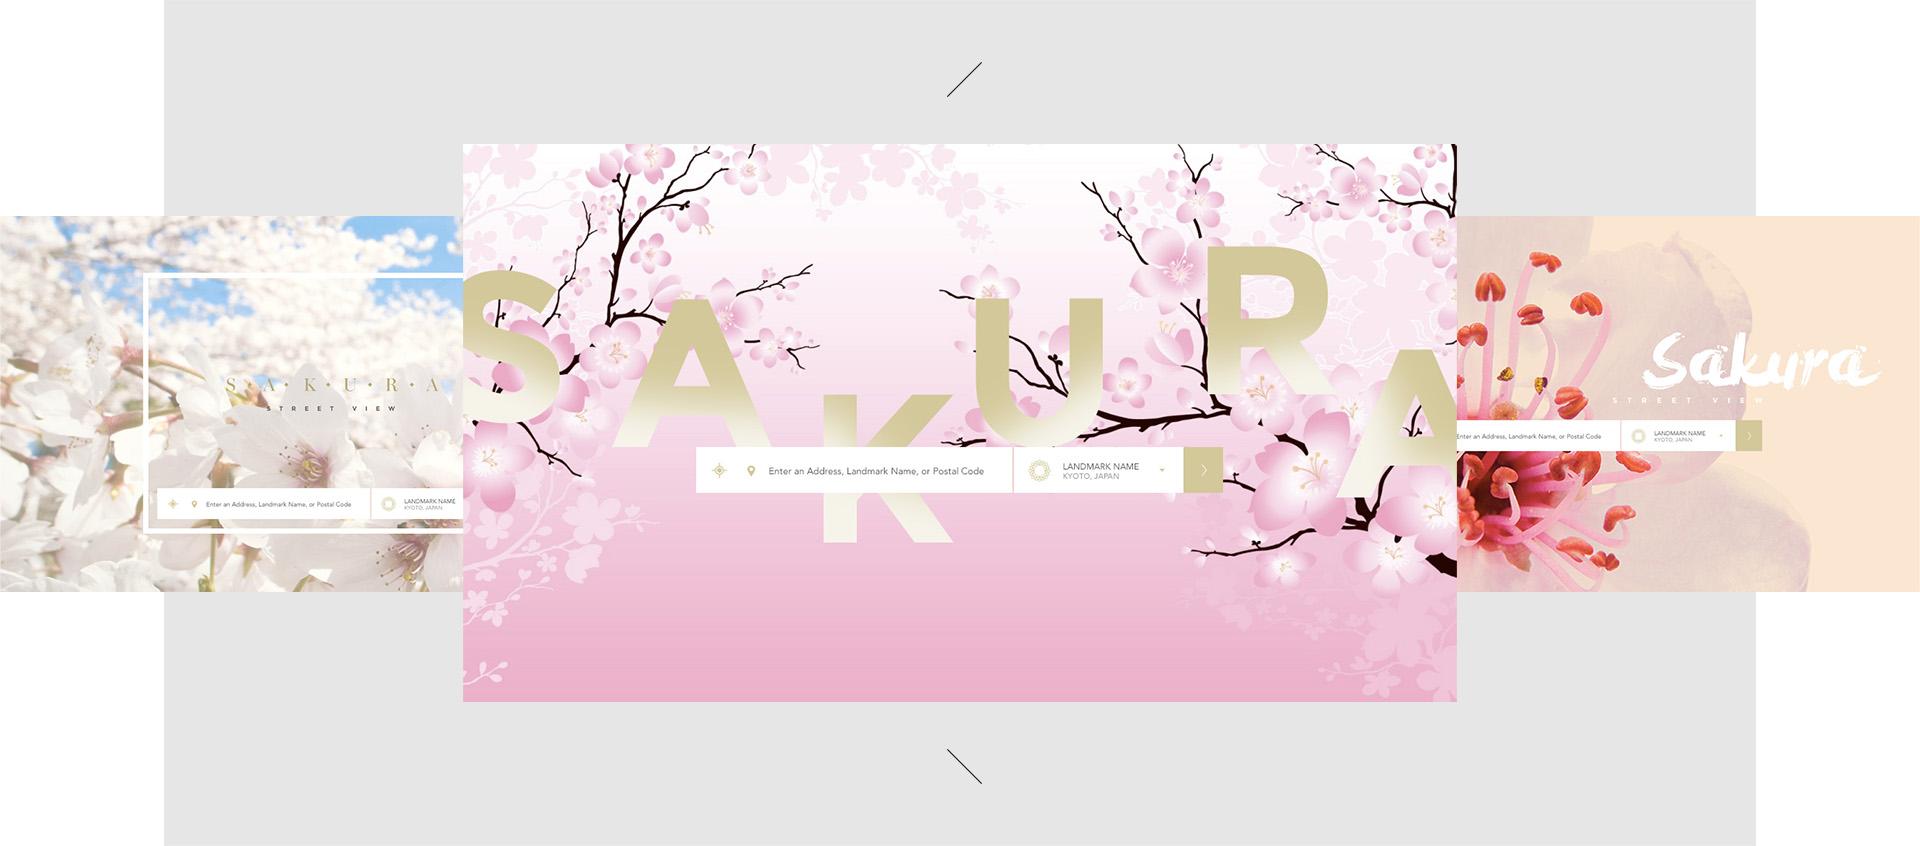 sakura-exploration-01.jpg